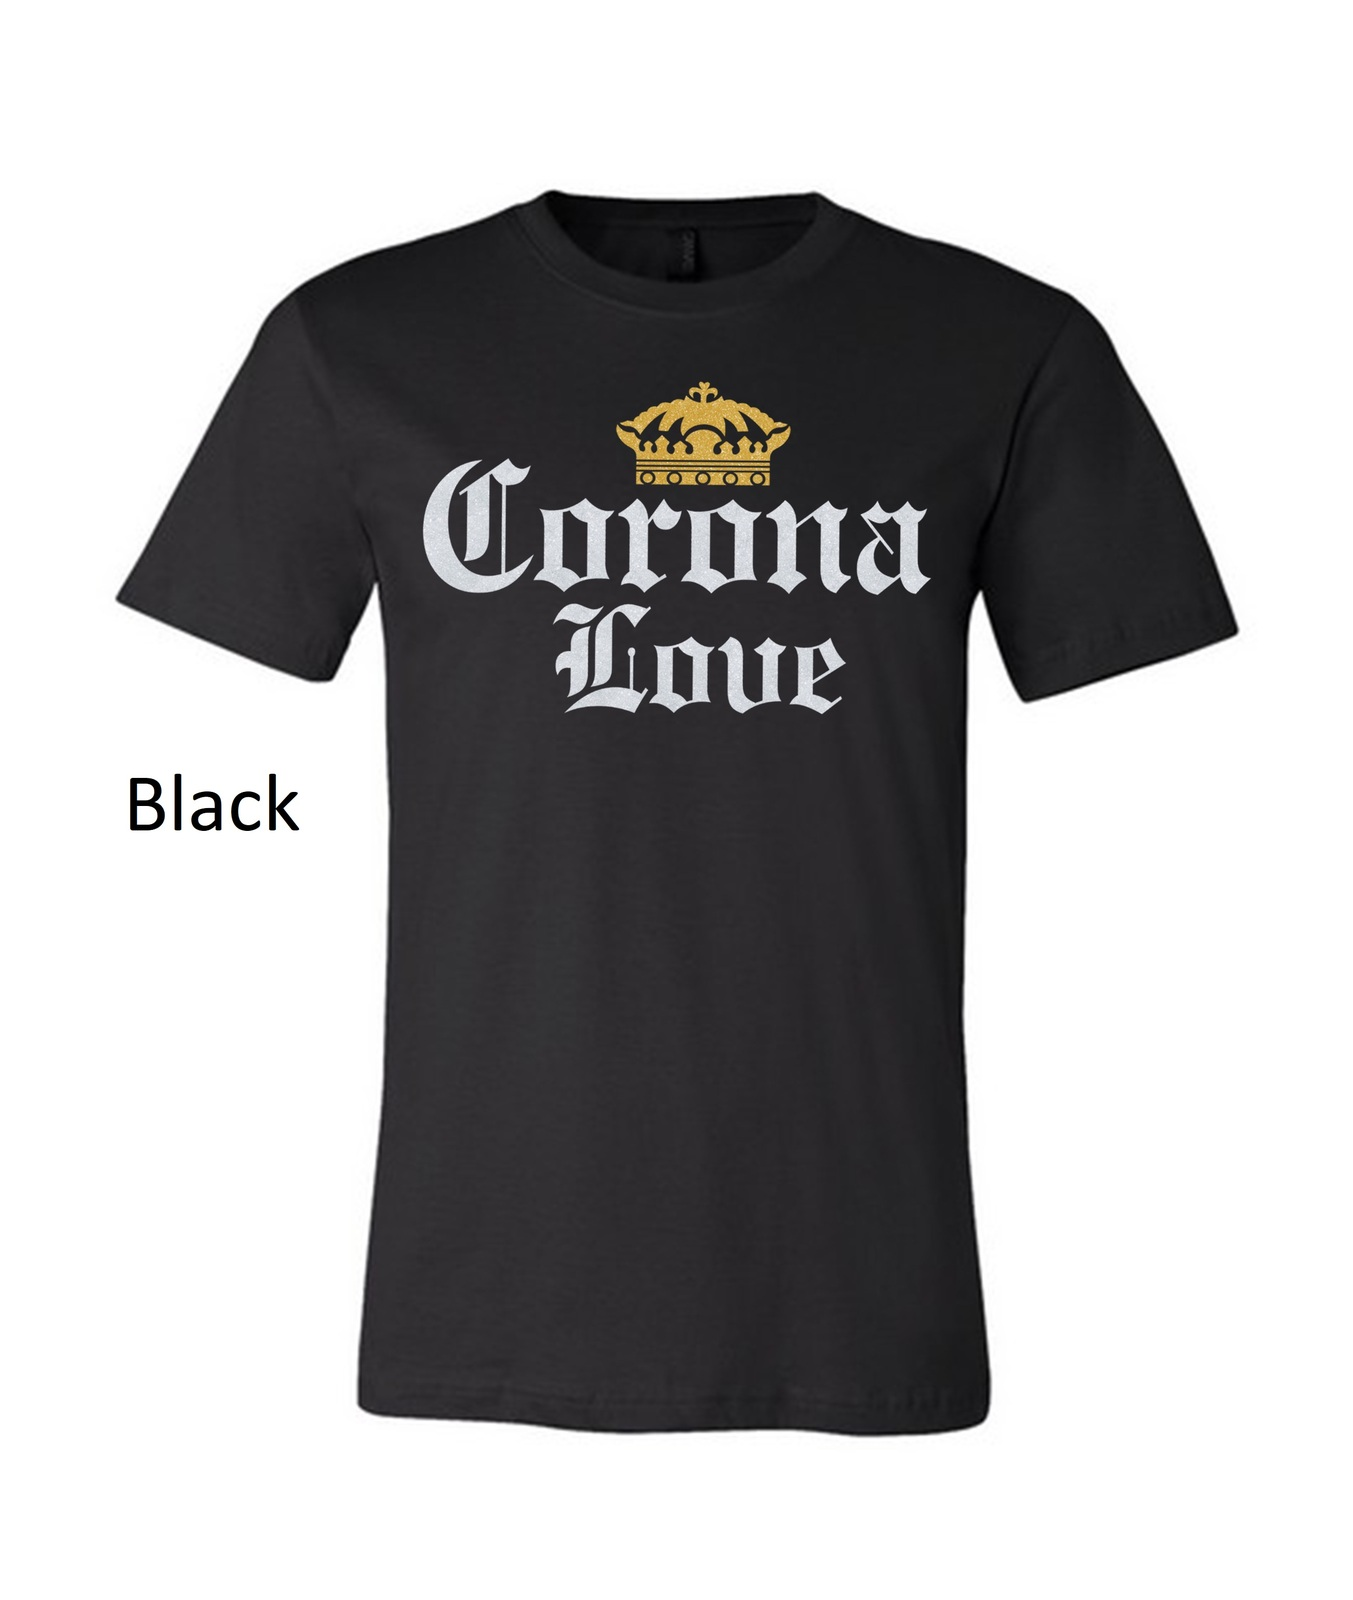 corona love Corona extra Bottle beer T Shirt, cinco de mayo party tee shirt image 8